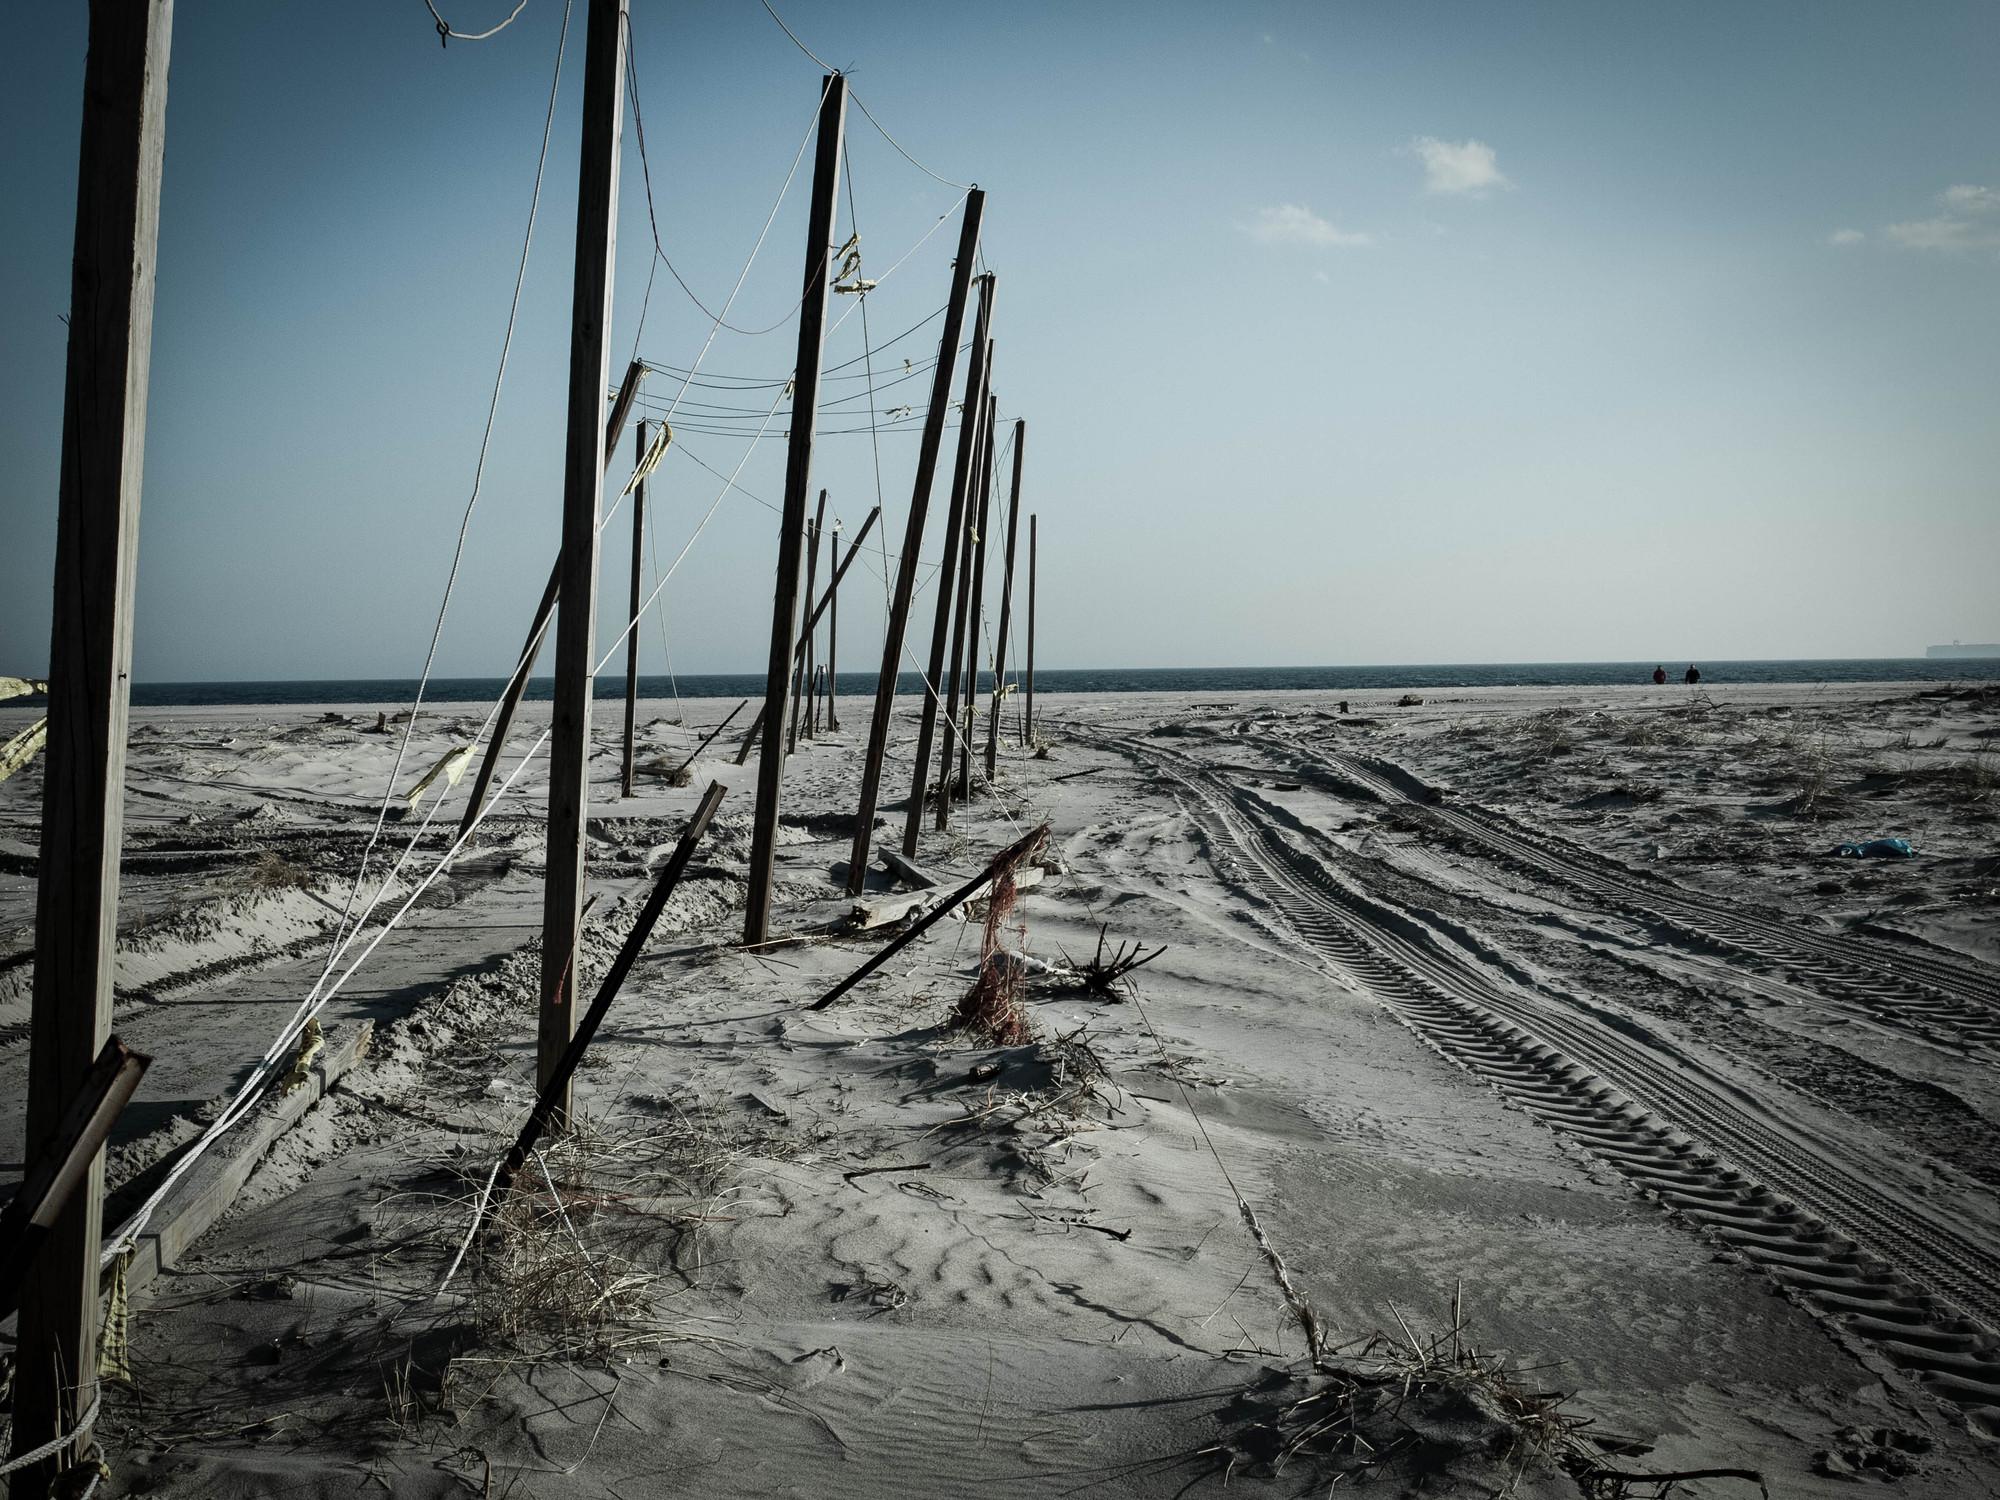 'Resilient Rockaways': MOMA PS1 Rockaway Call for Ideas Winning Proposal / Brennan Baxley, absent sand dunes / © Brennan Baxley